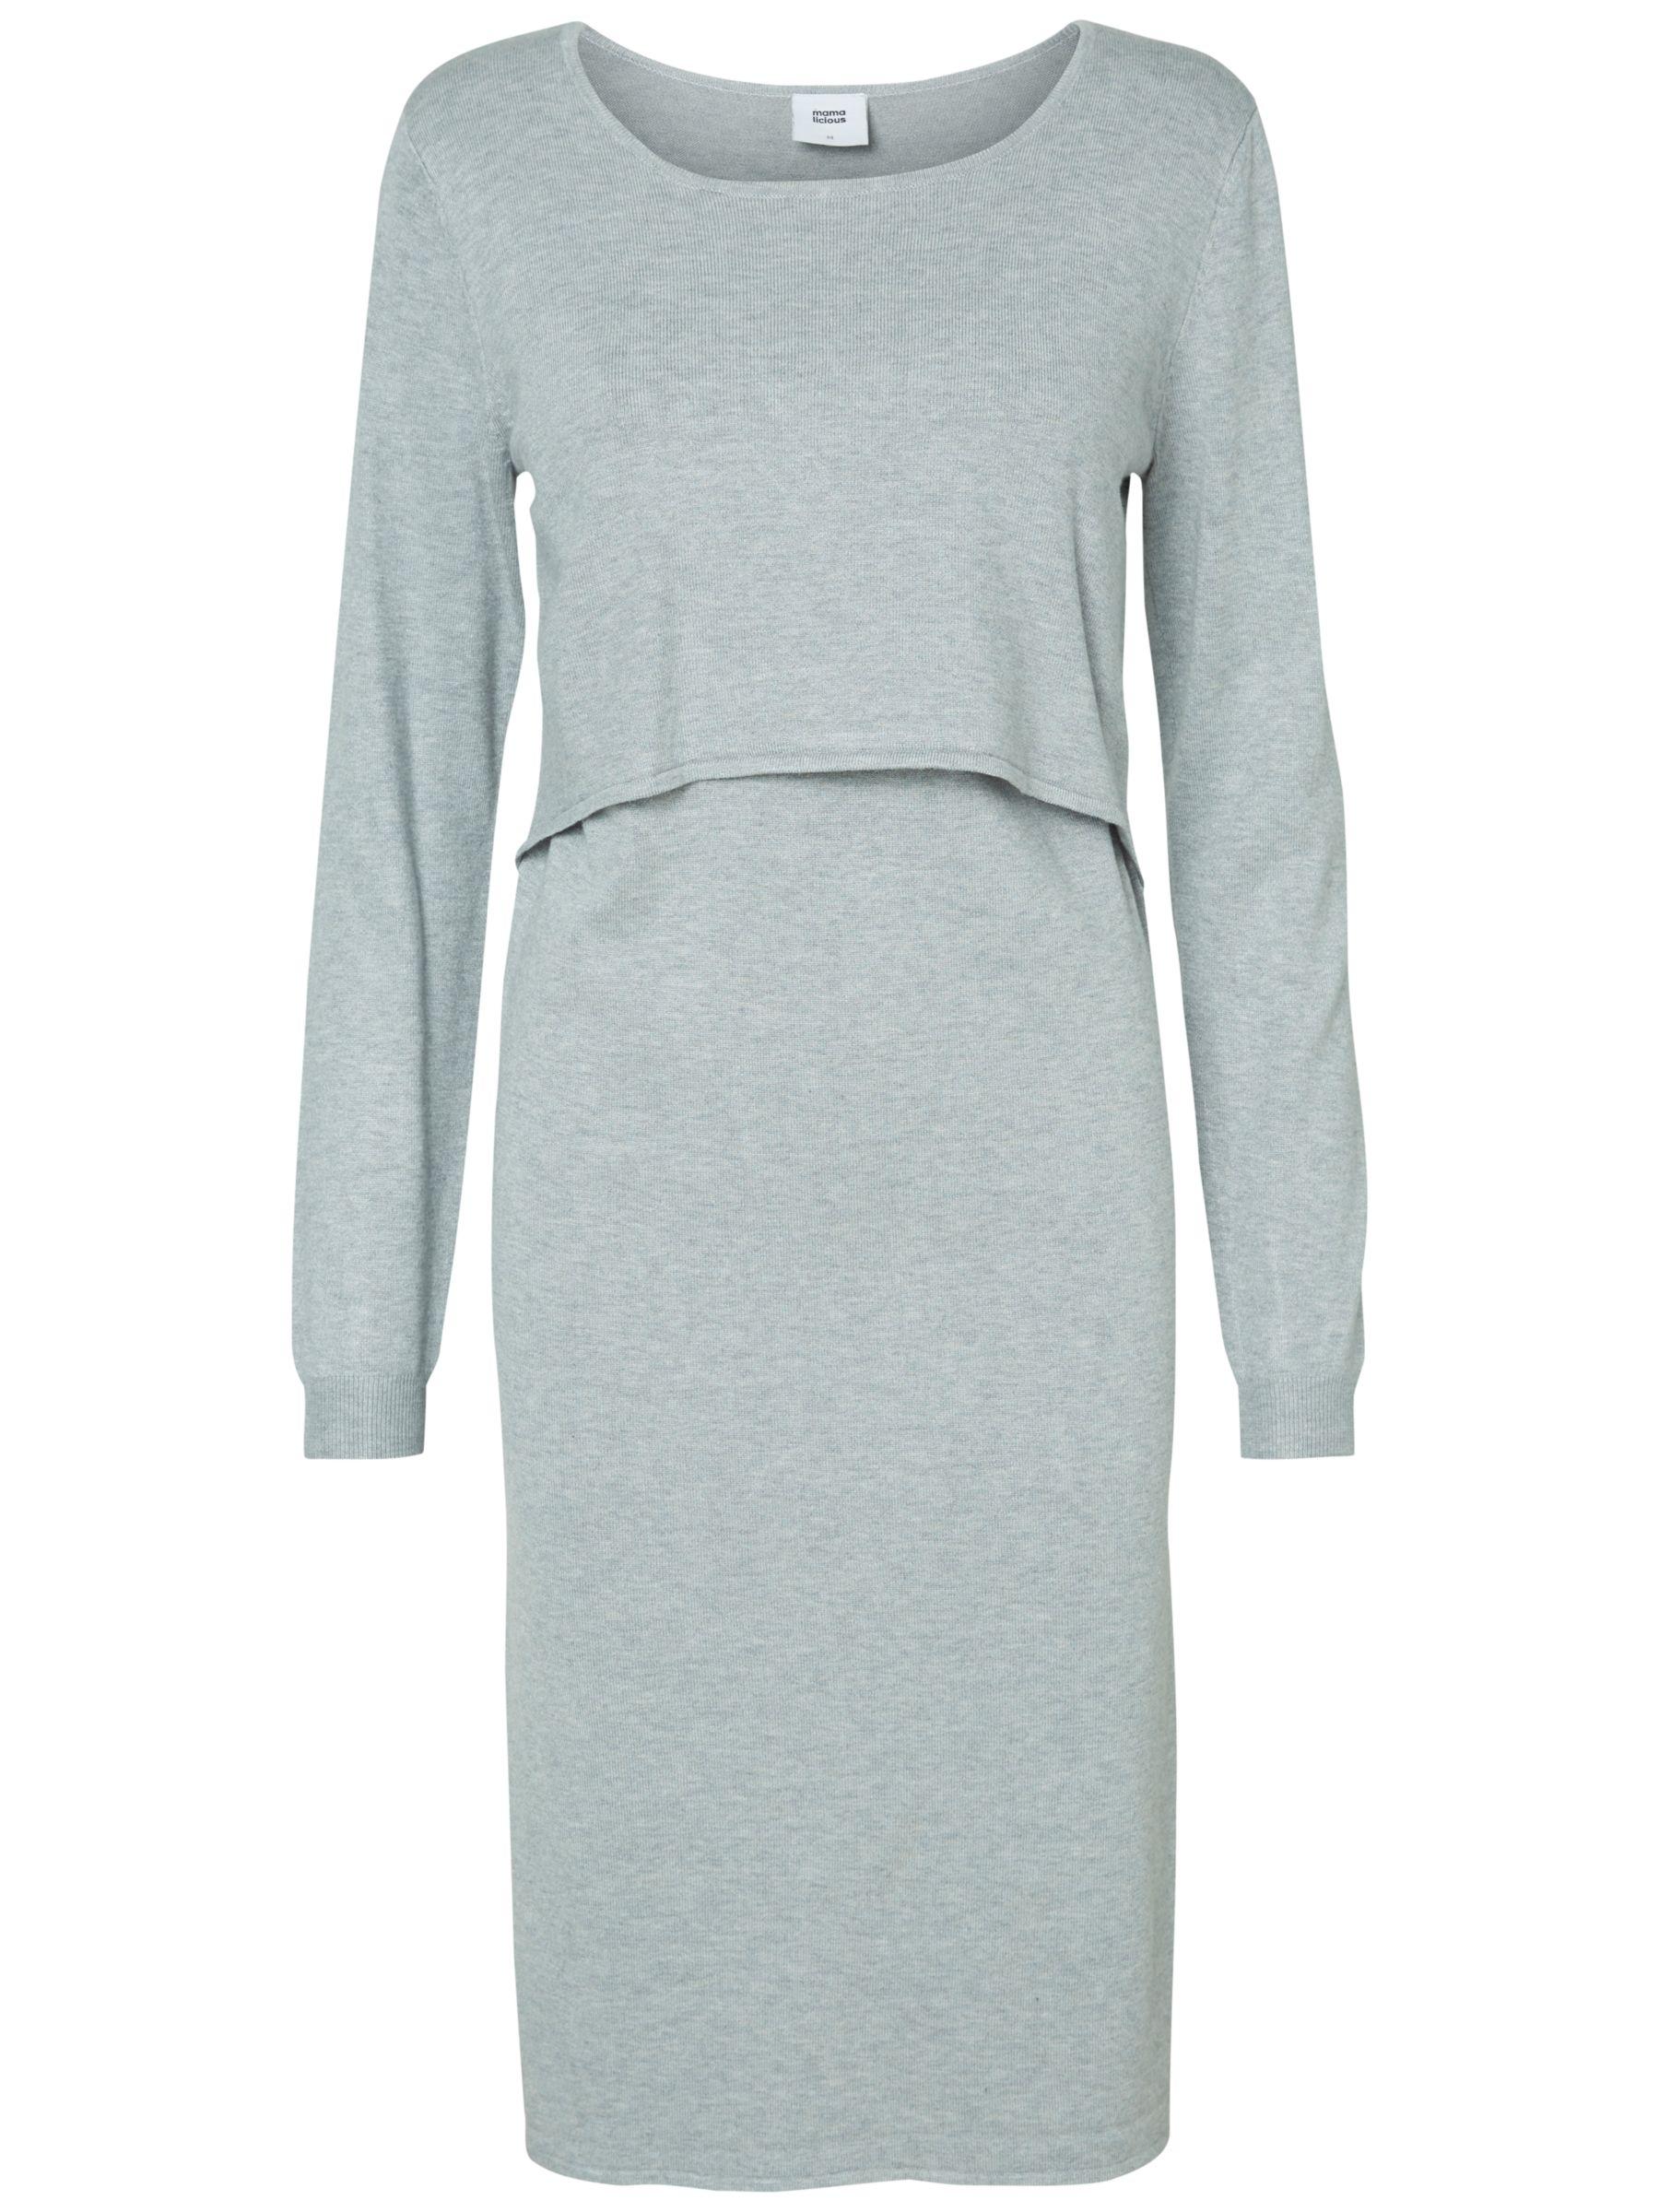 Mamalicious Mamalicious Long Sleeved Knit Maternity Nursing Dress, Light Grey